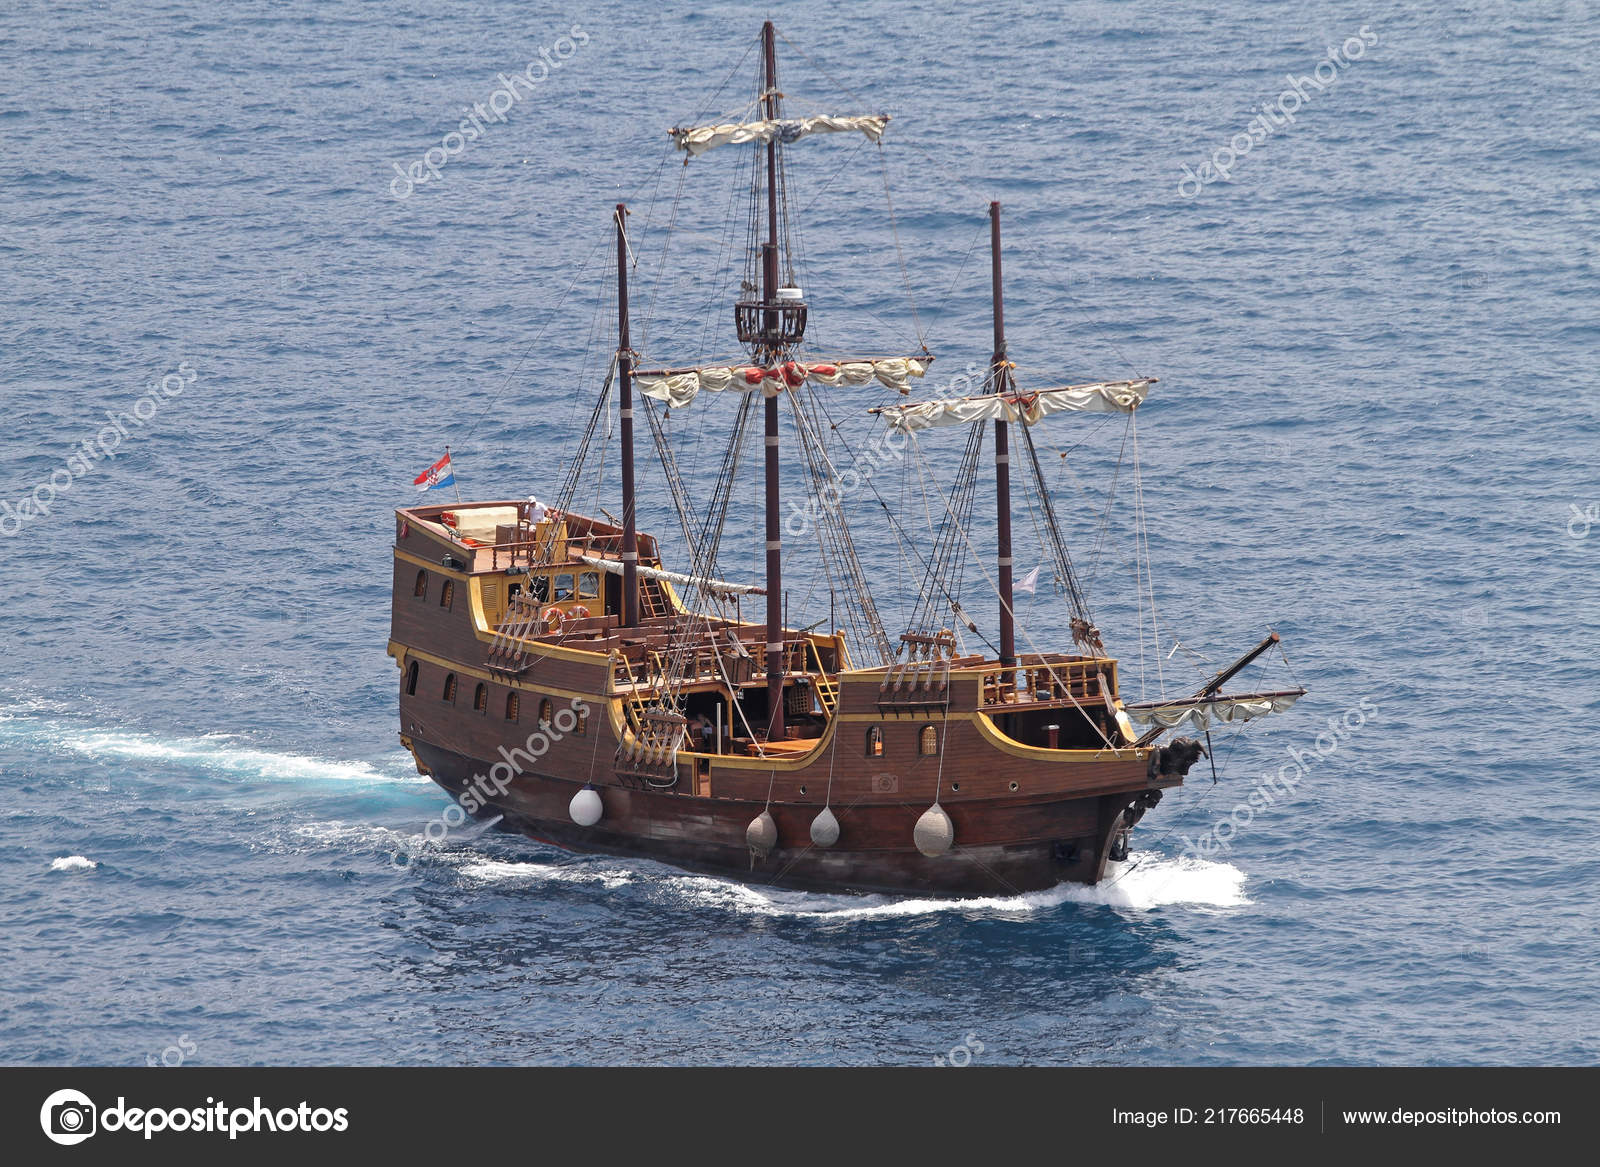 Berühmt Mittelalterlichen Piraten Schiff Replik Adria — Stockfoto PI85